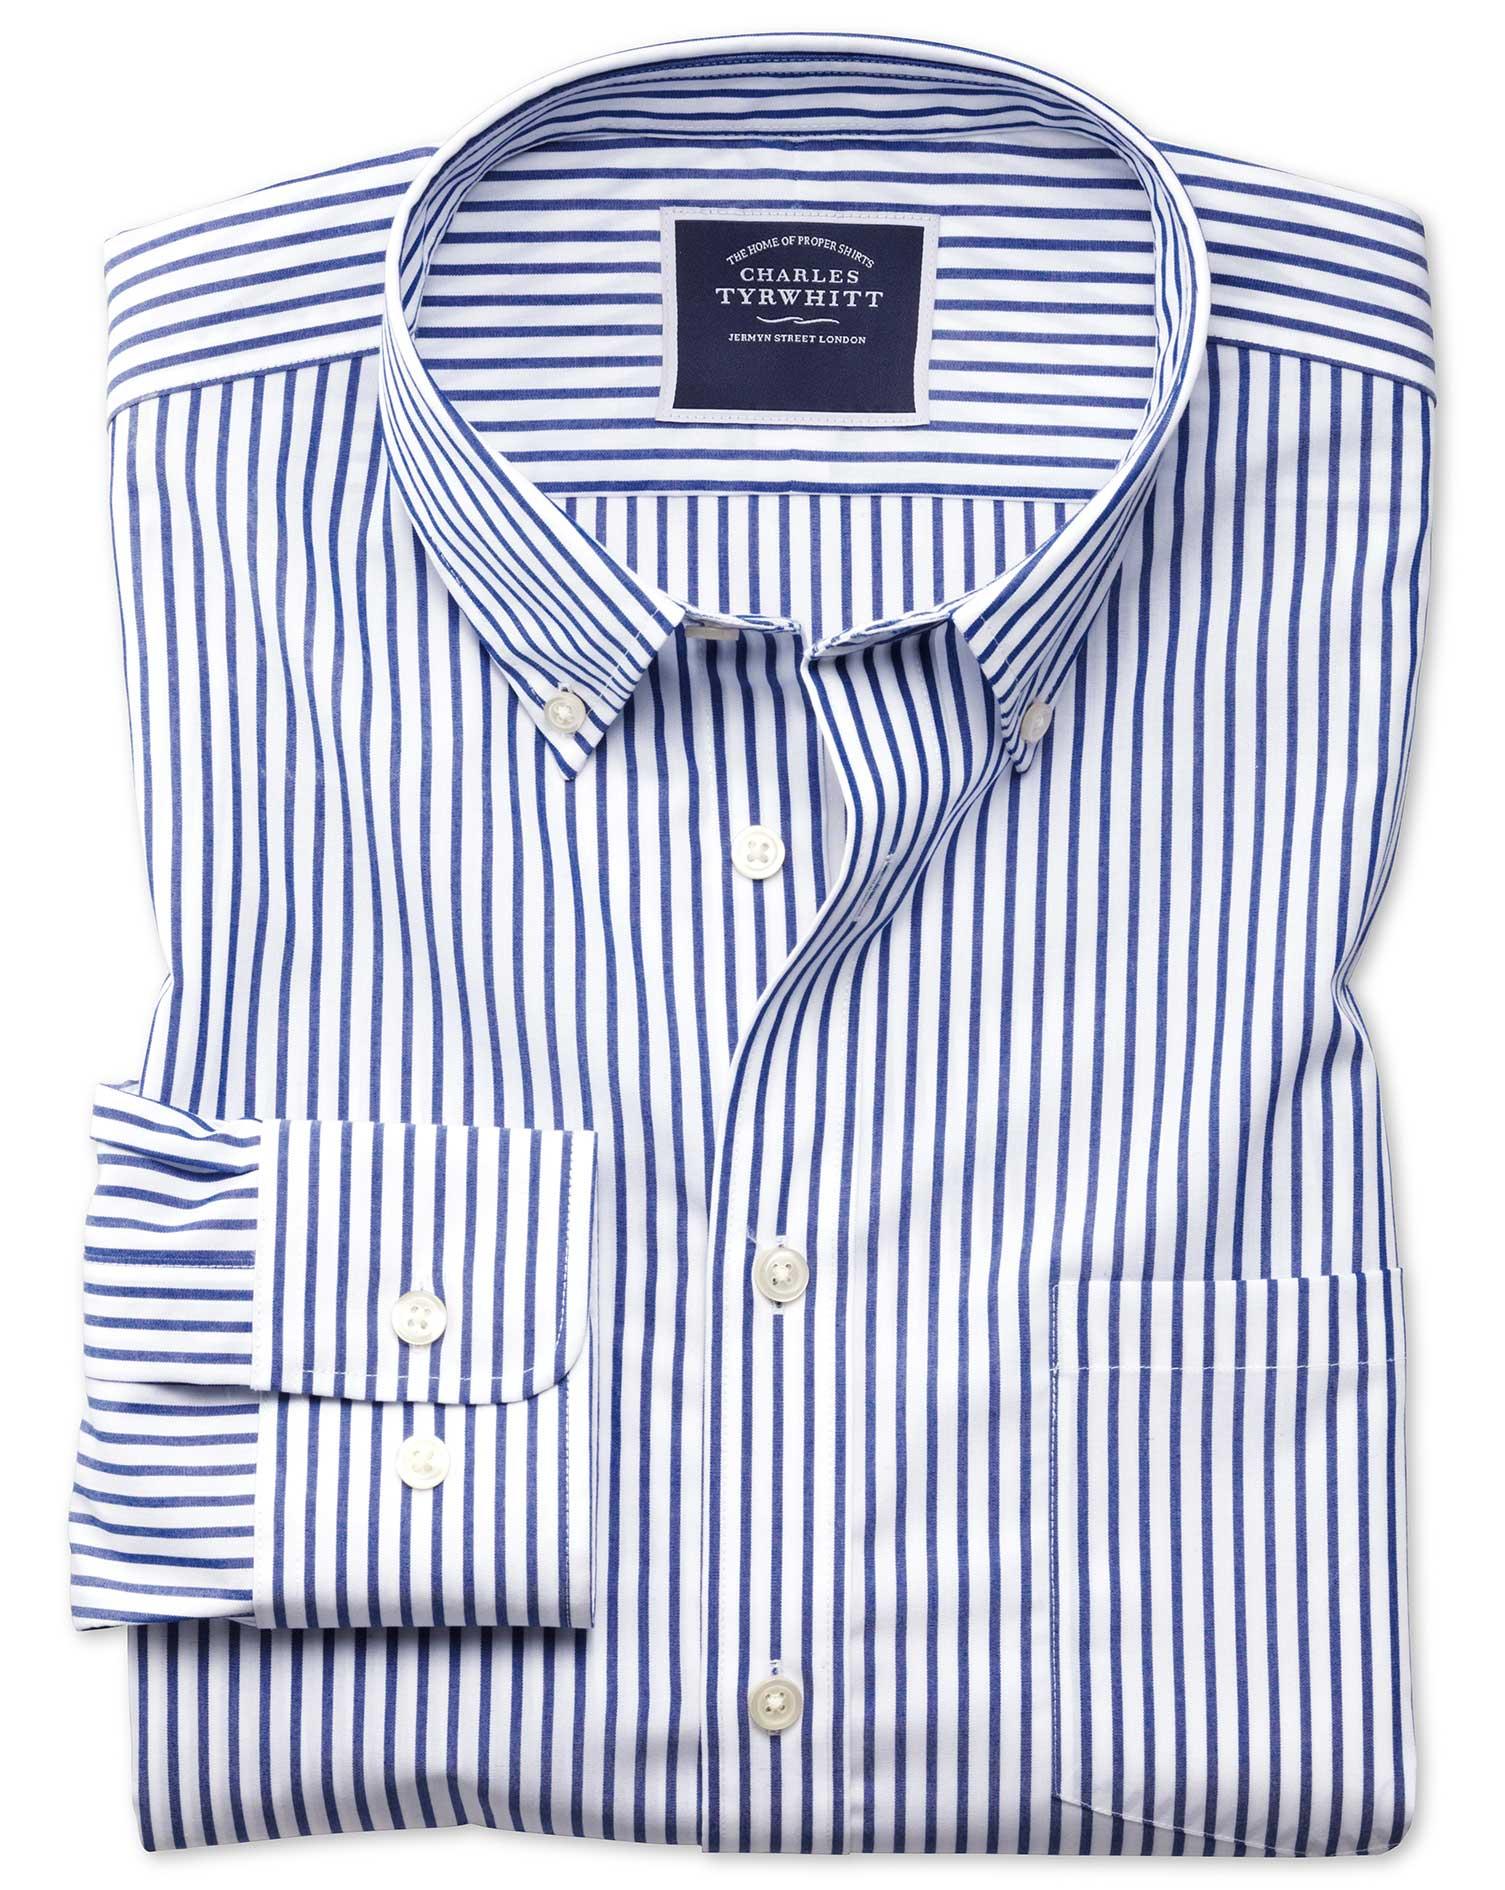 Classic Fit Button-Down Non-Iron Poplin Blue Stripe Cotton Shirt Single Cuff Size Medium by Charles